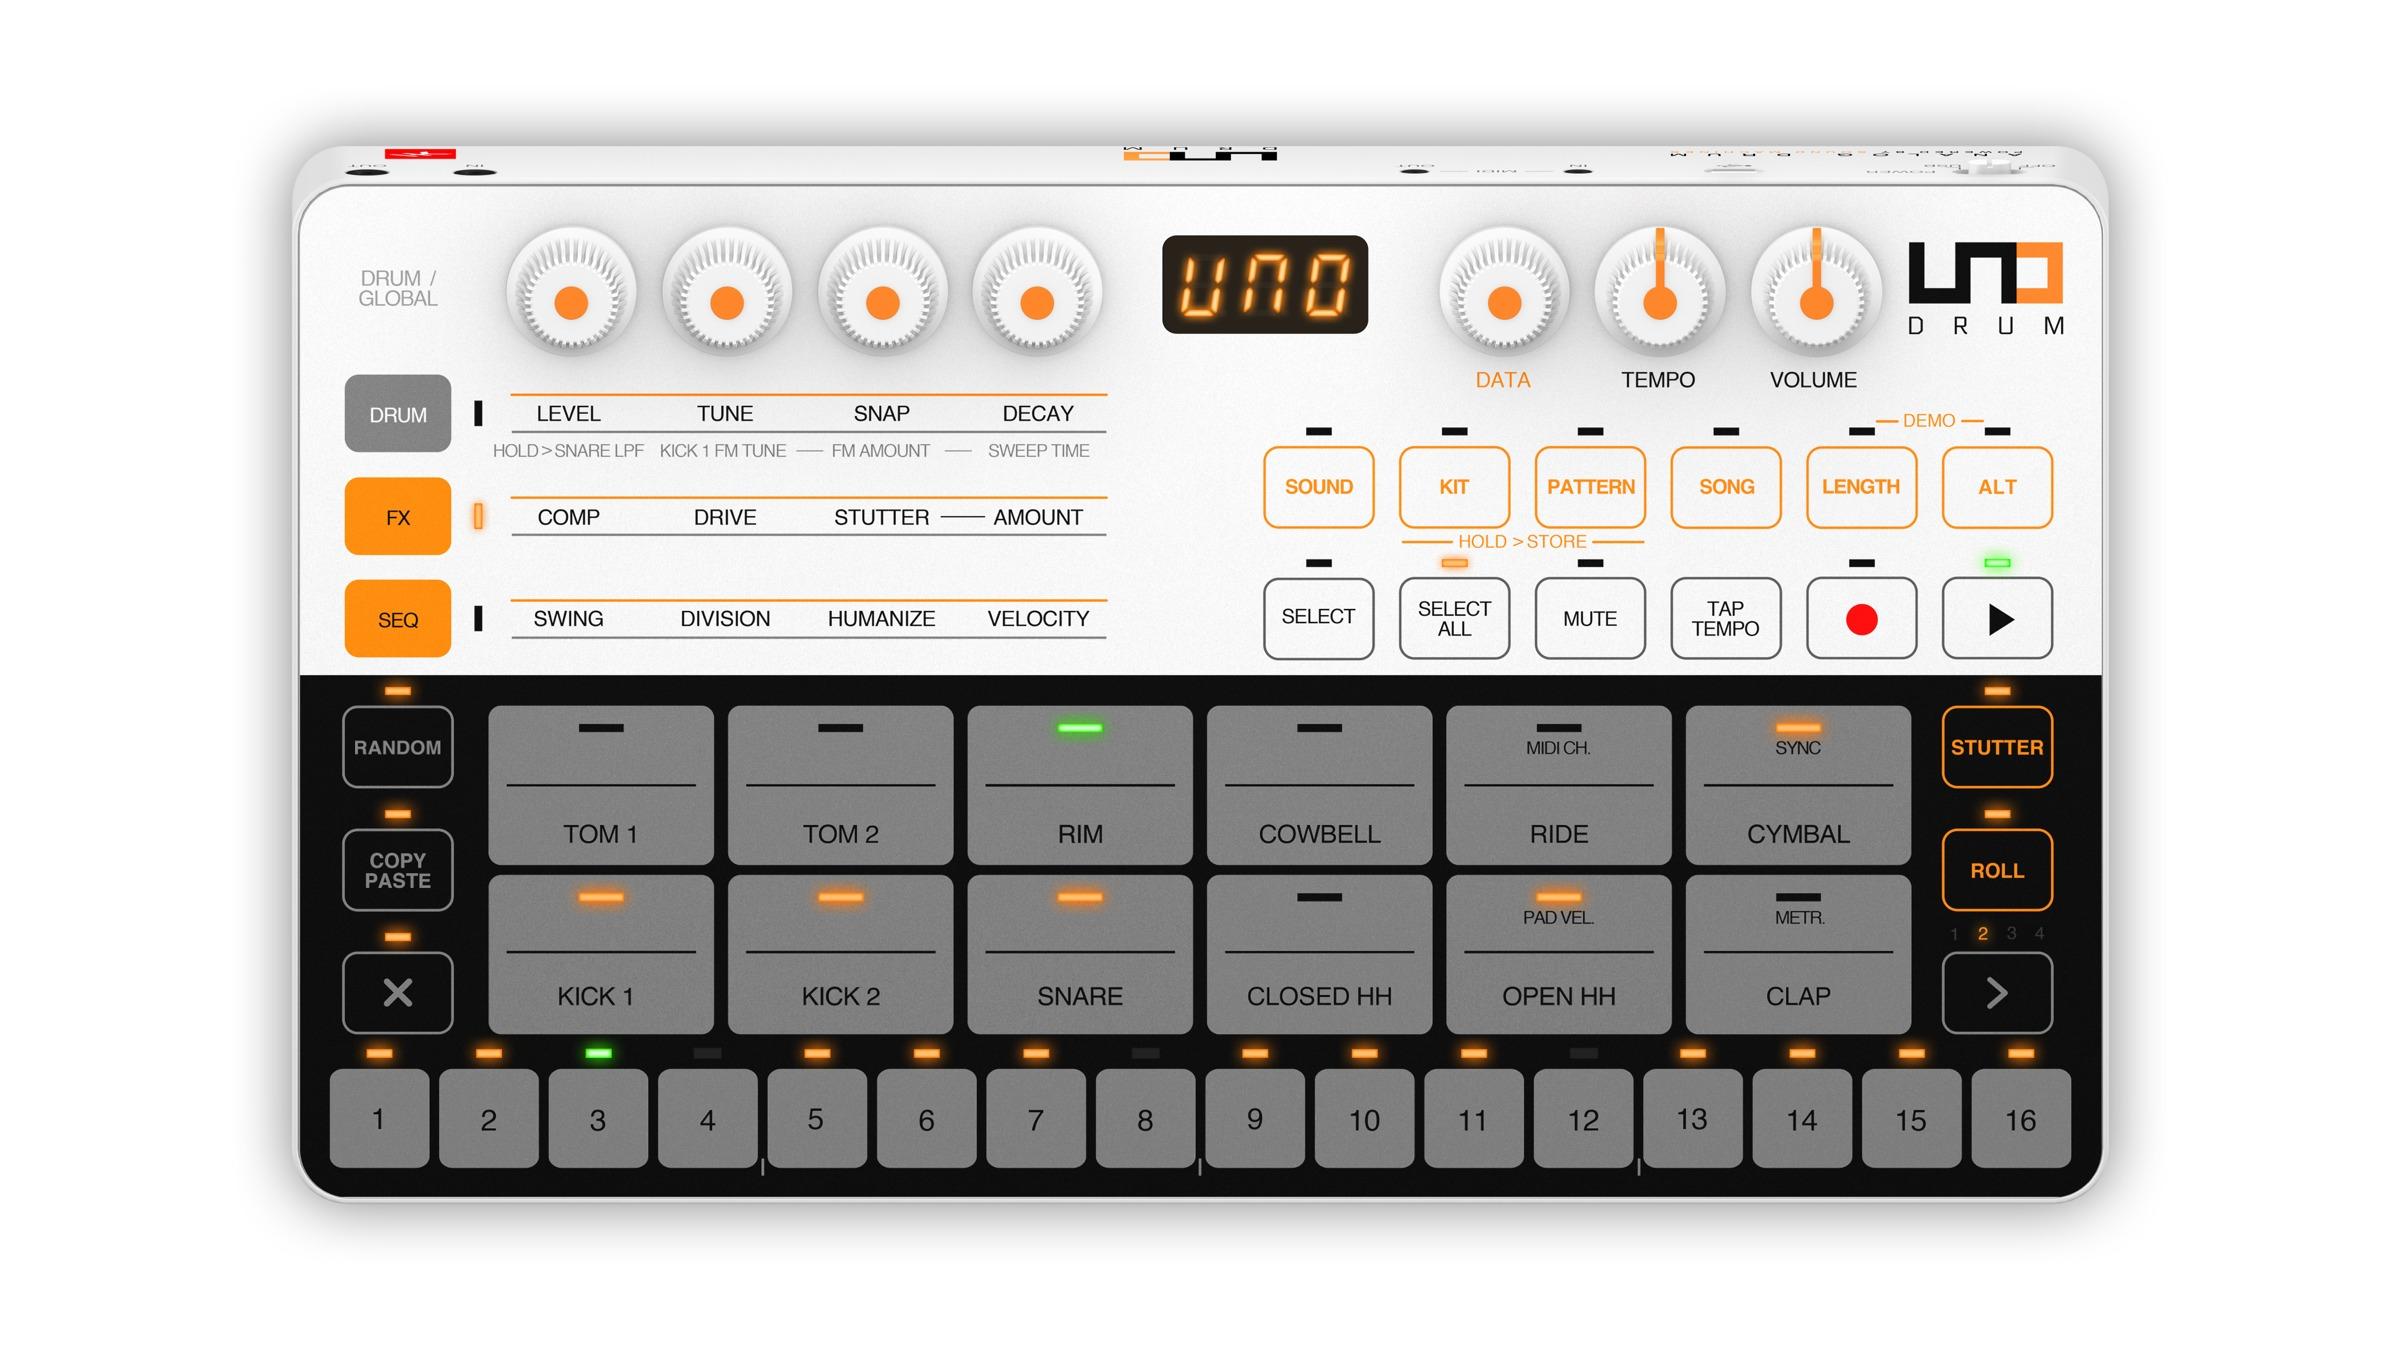 ik uno drum portable analog pcm drum machine cdm create digital music. Black Bedroom Furniture Sets. Home Design Ideas